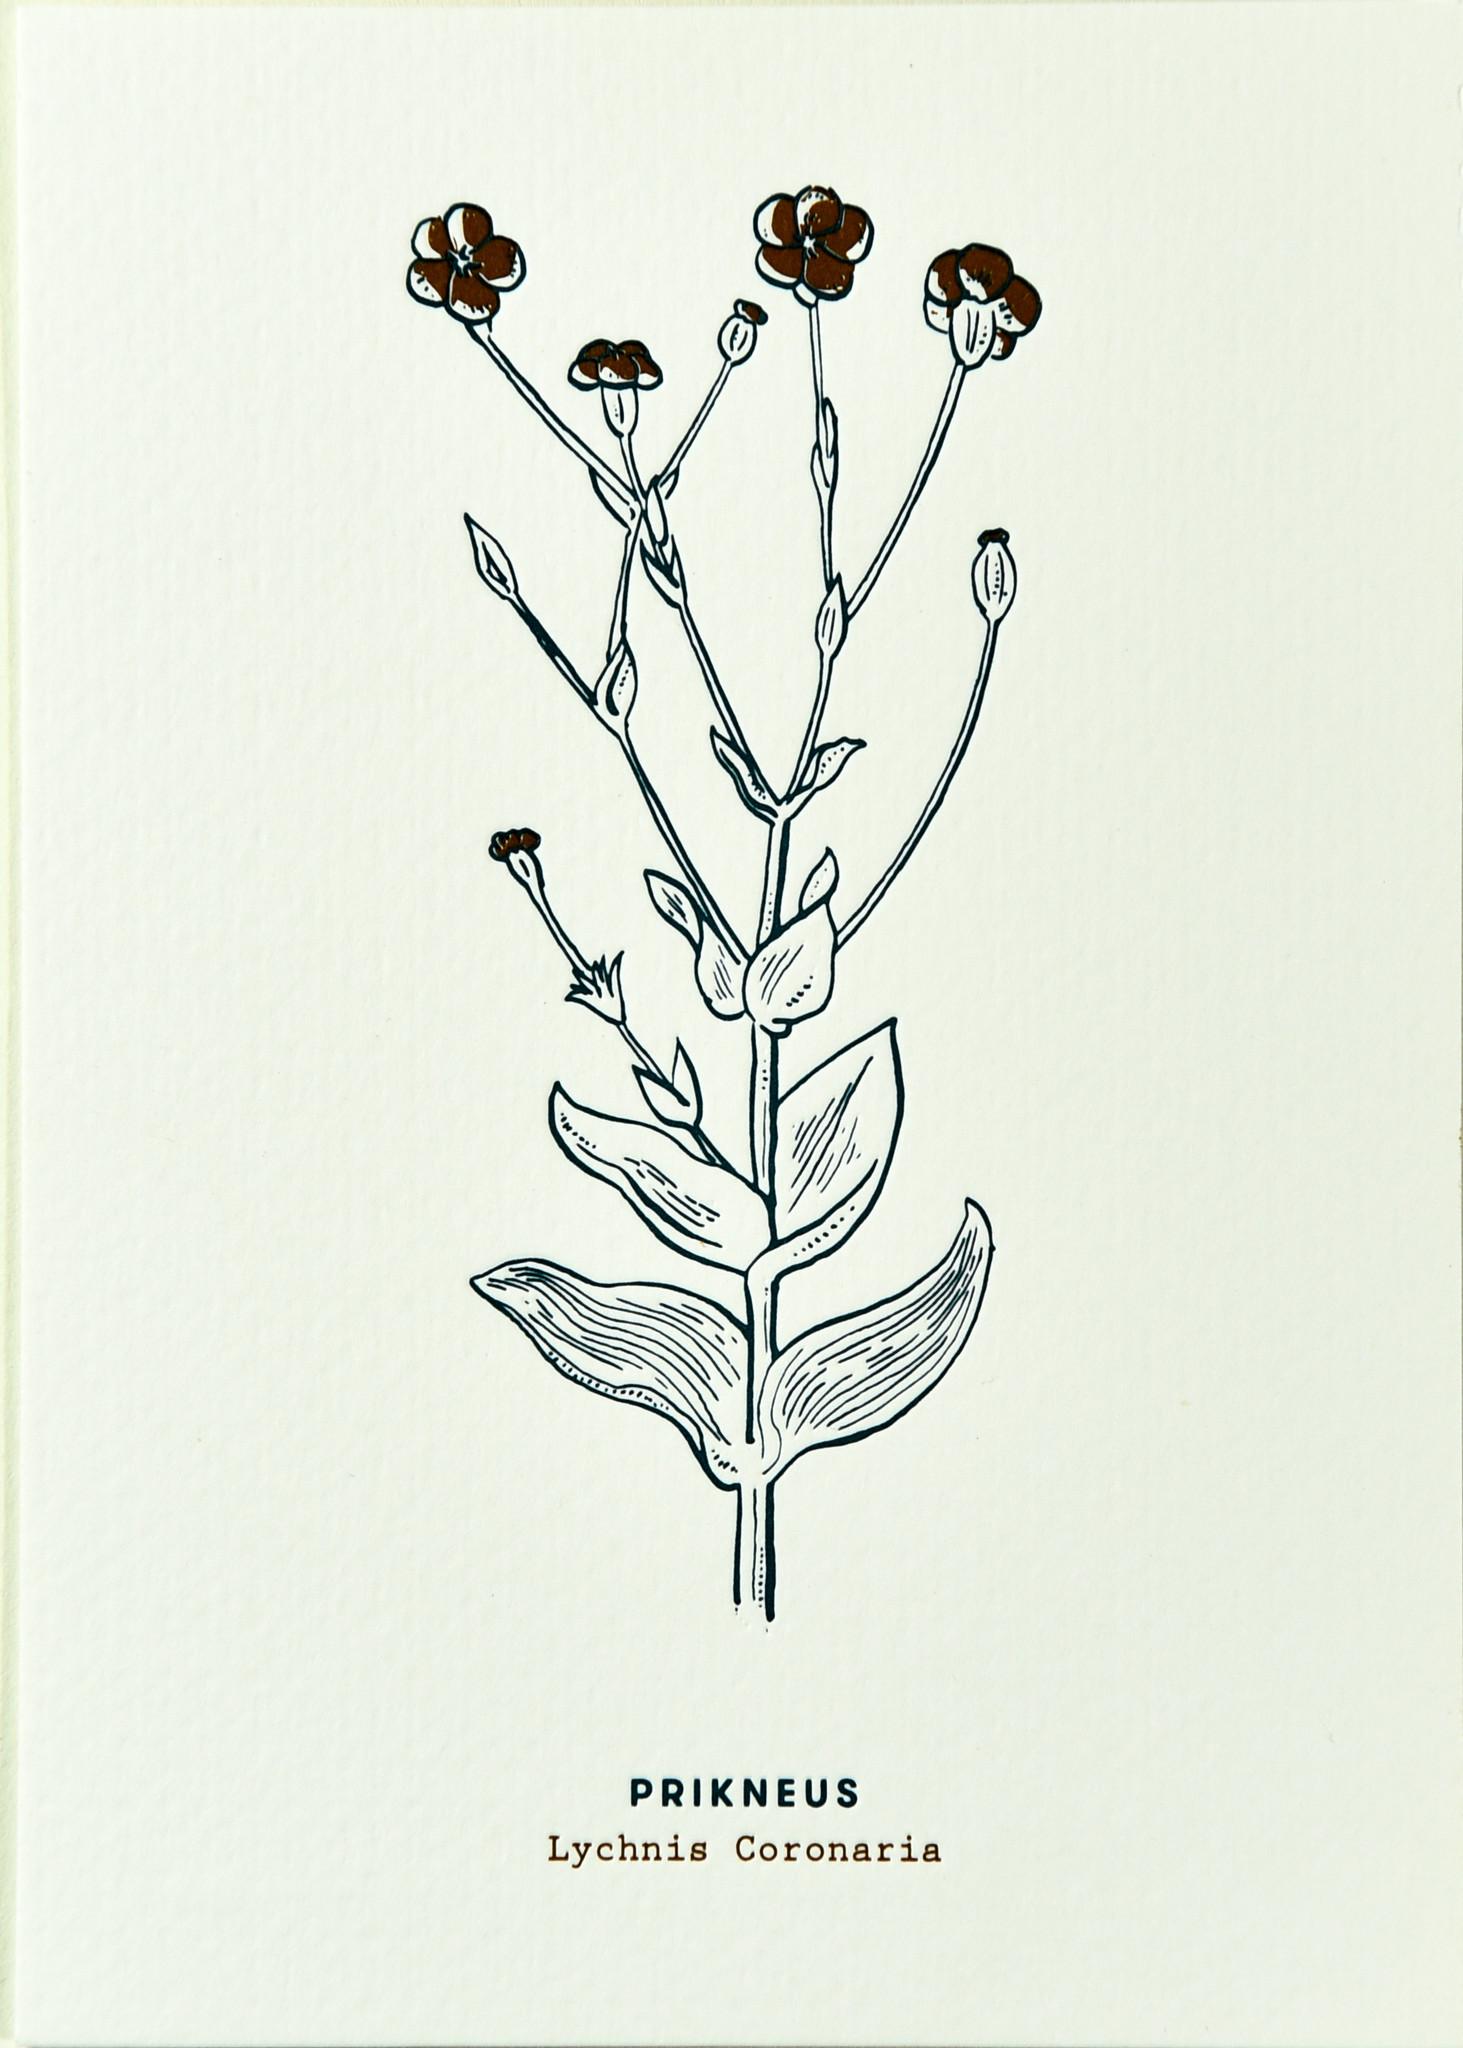 Blommm Luxe postkaart Prikneus - Blommm